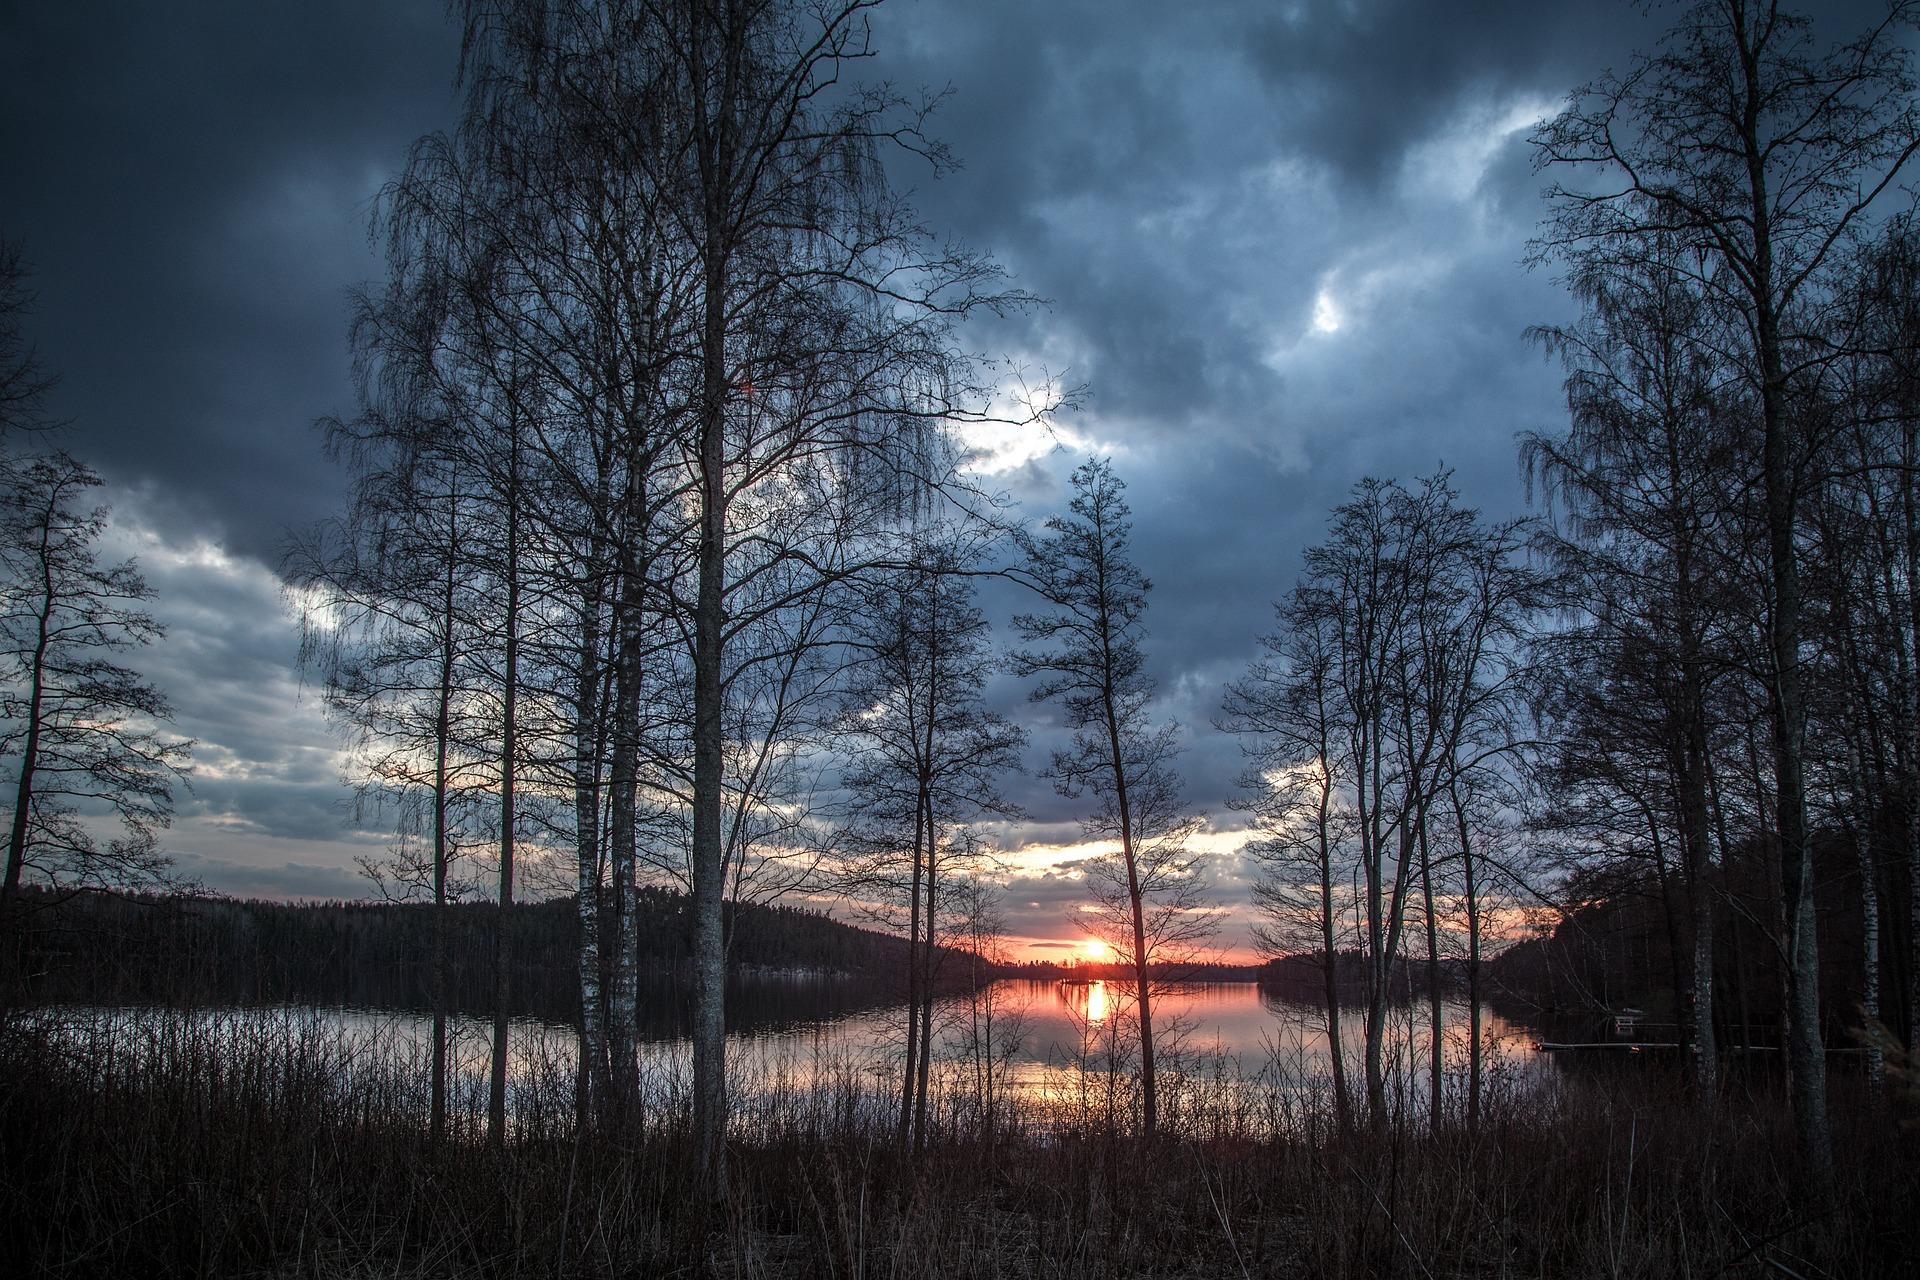 lake-scenery-1365288_1920